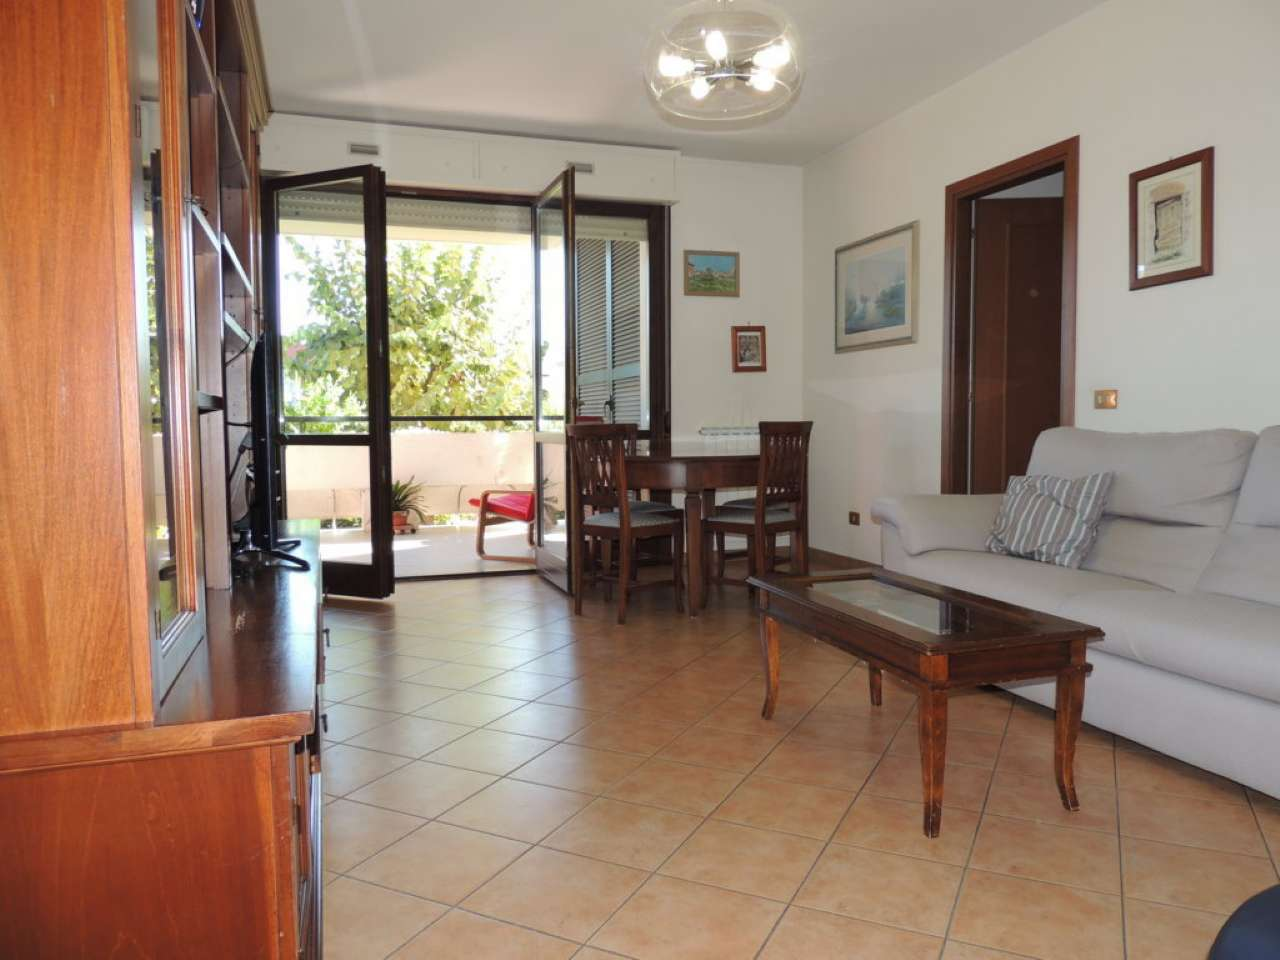 Appartamento in vendita 3 vani 85 mq.  via Luigi  Olivares 64 Roma